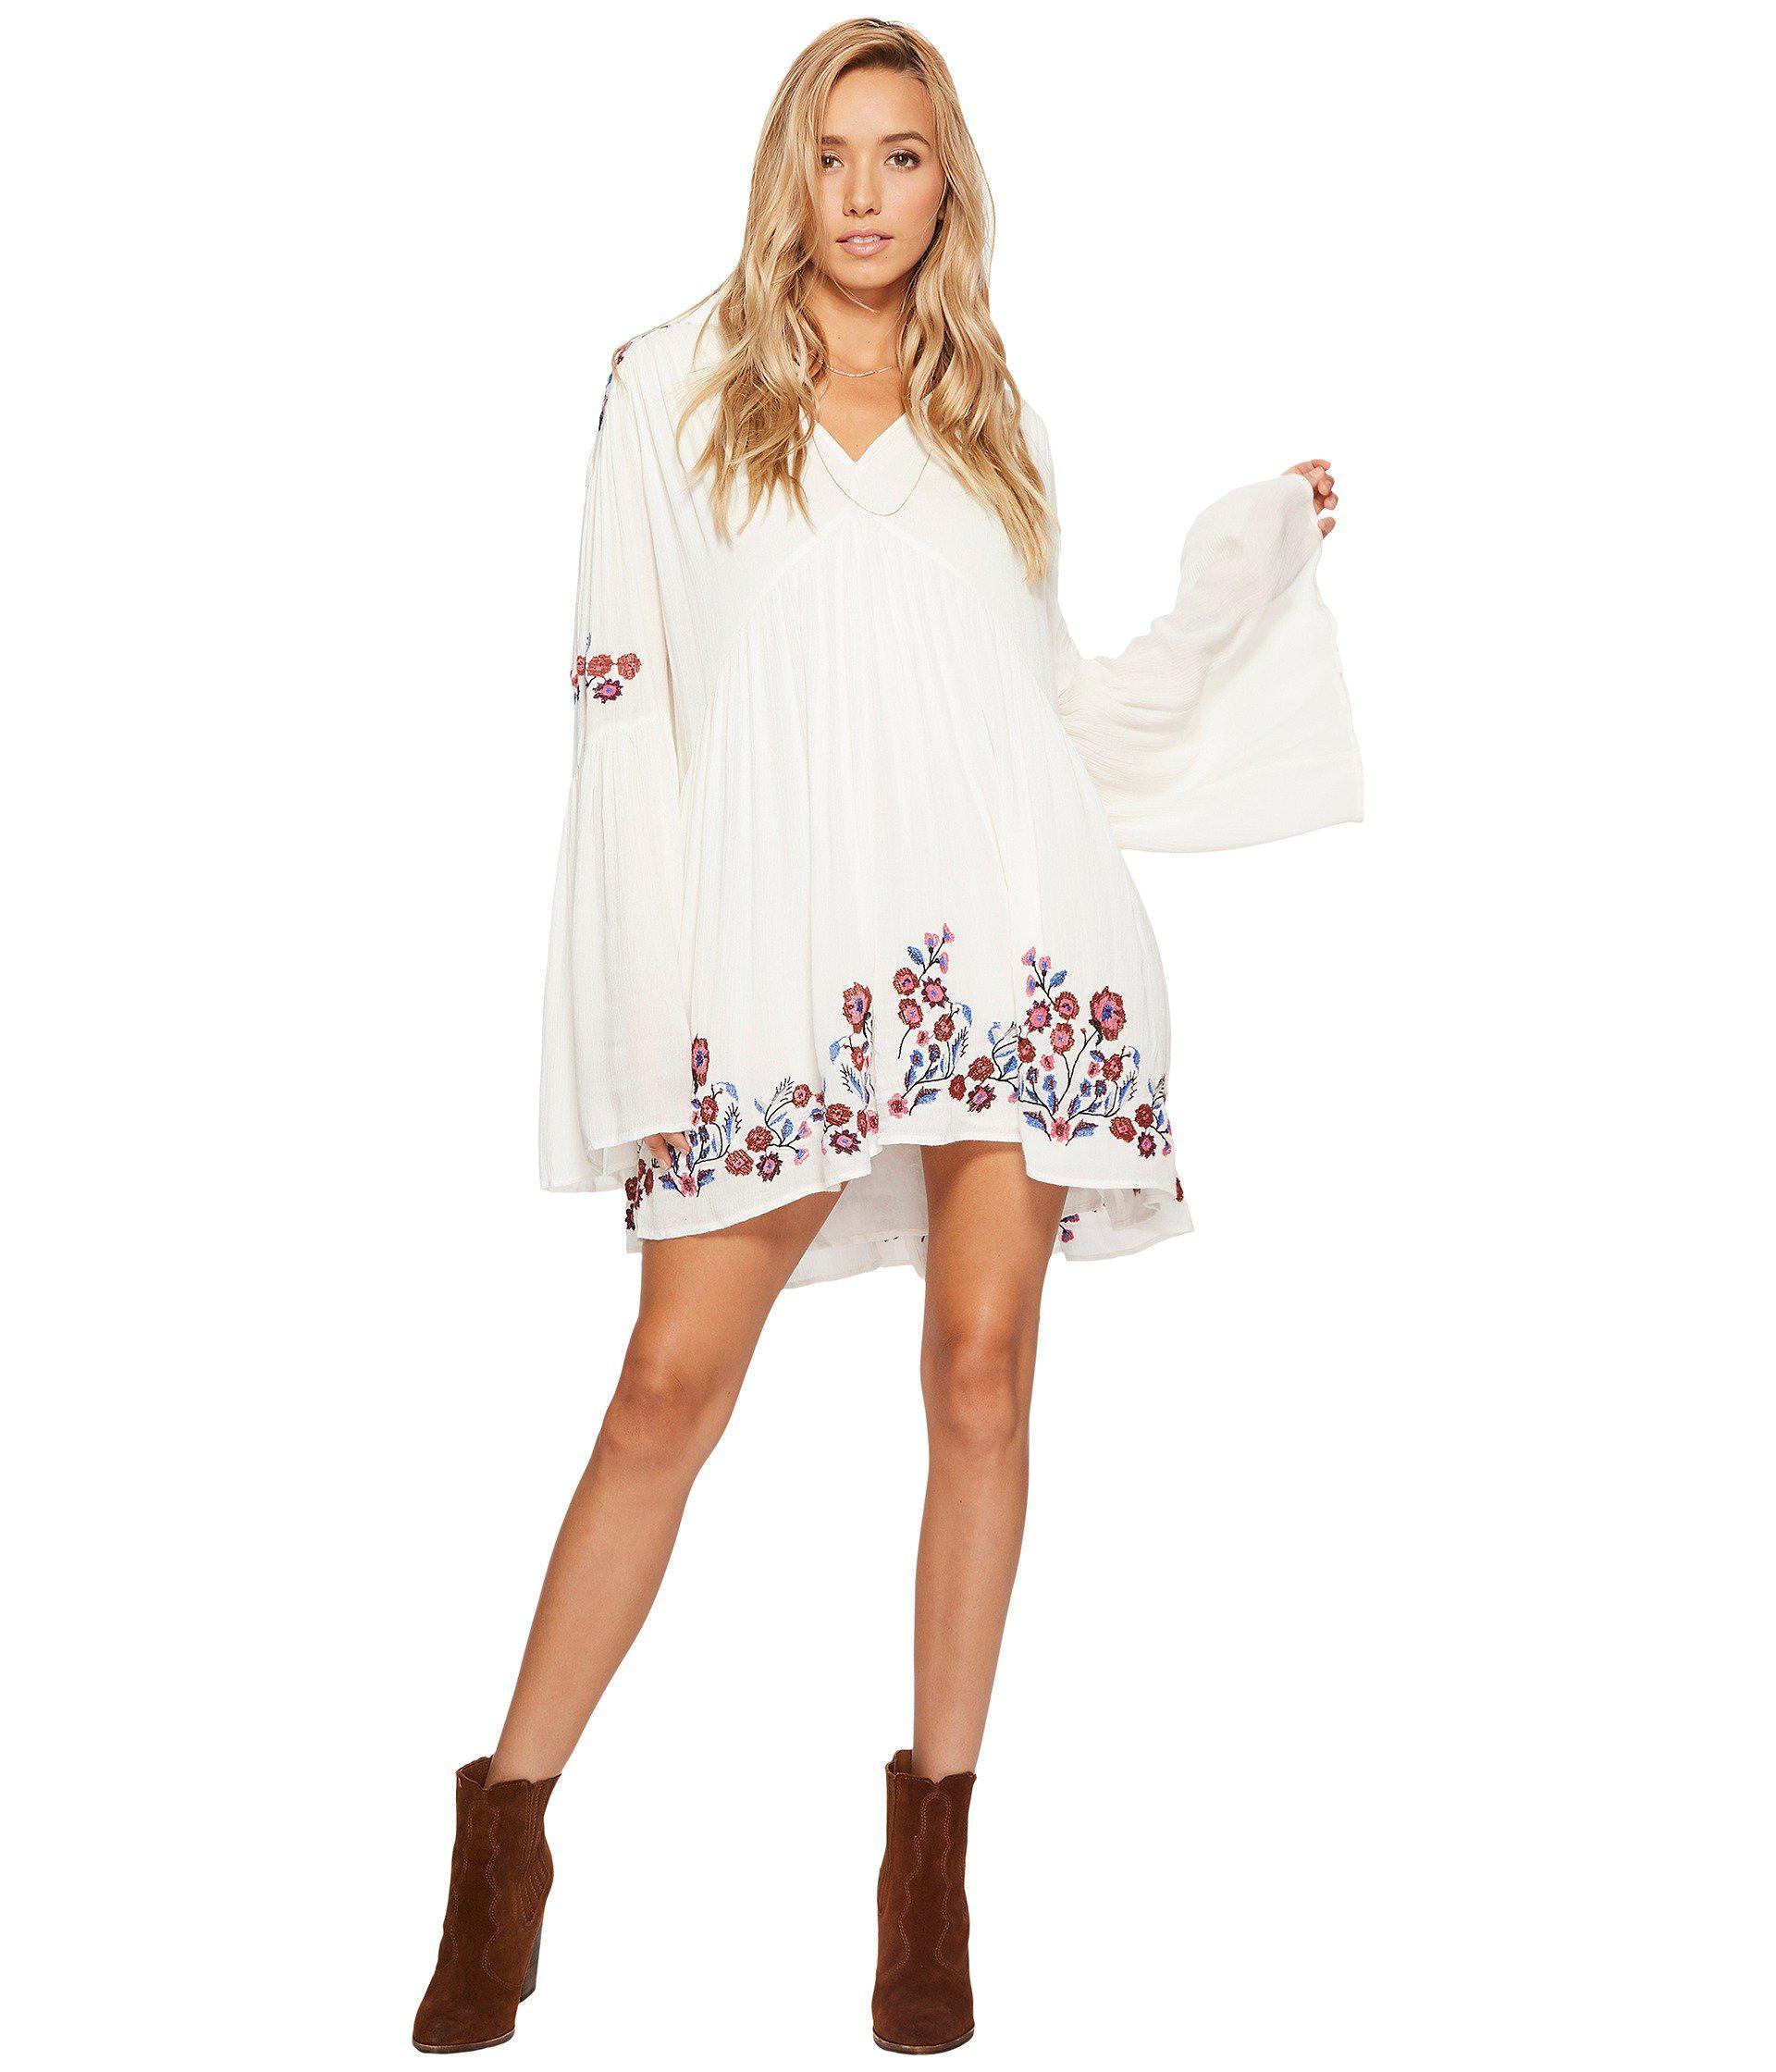 37e4e77f4445 Free People Te Amo Mini Dress in White - Lyst